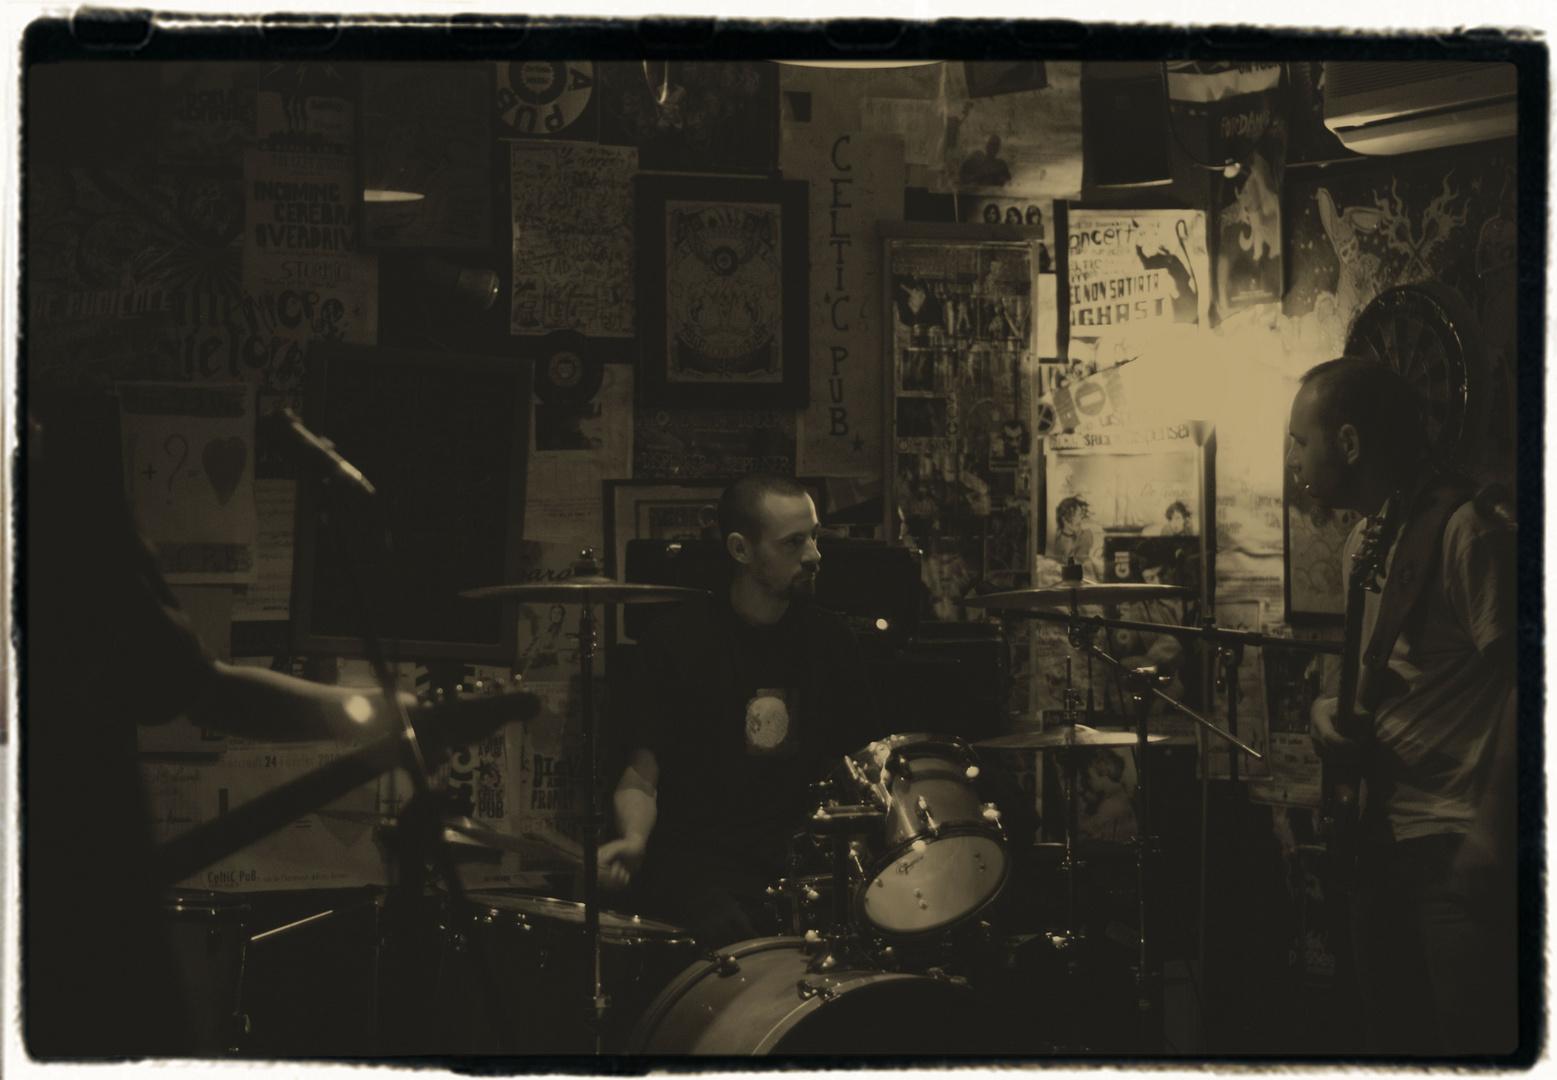 drummer's